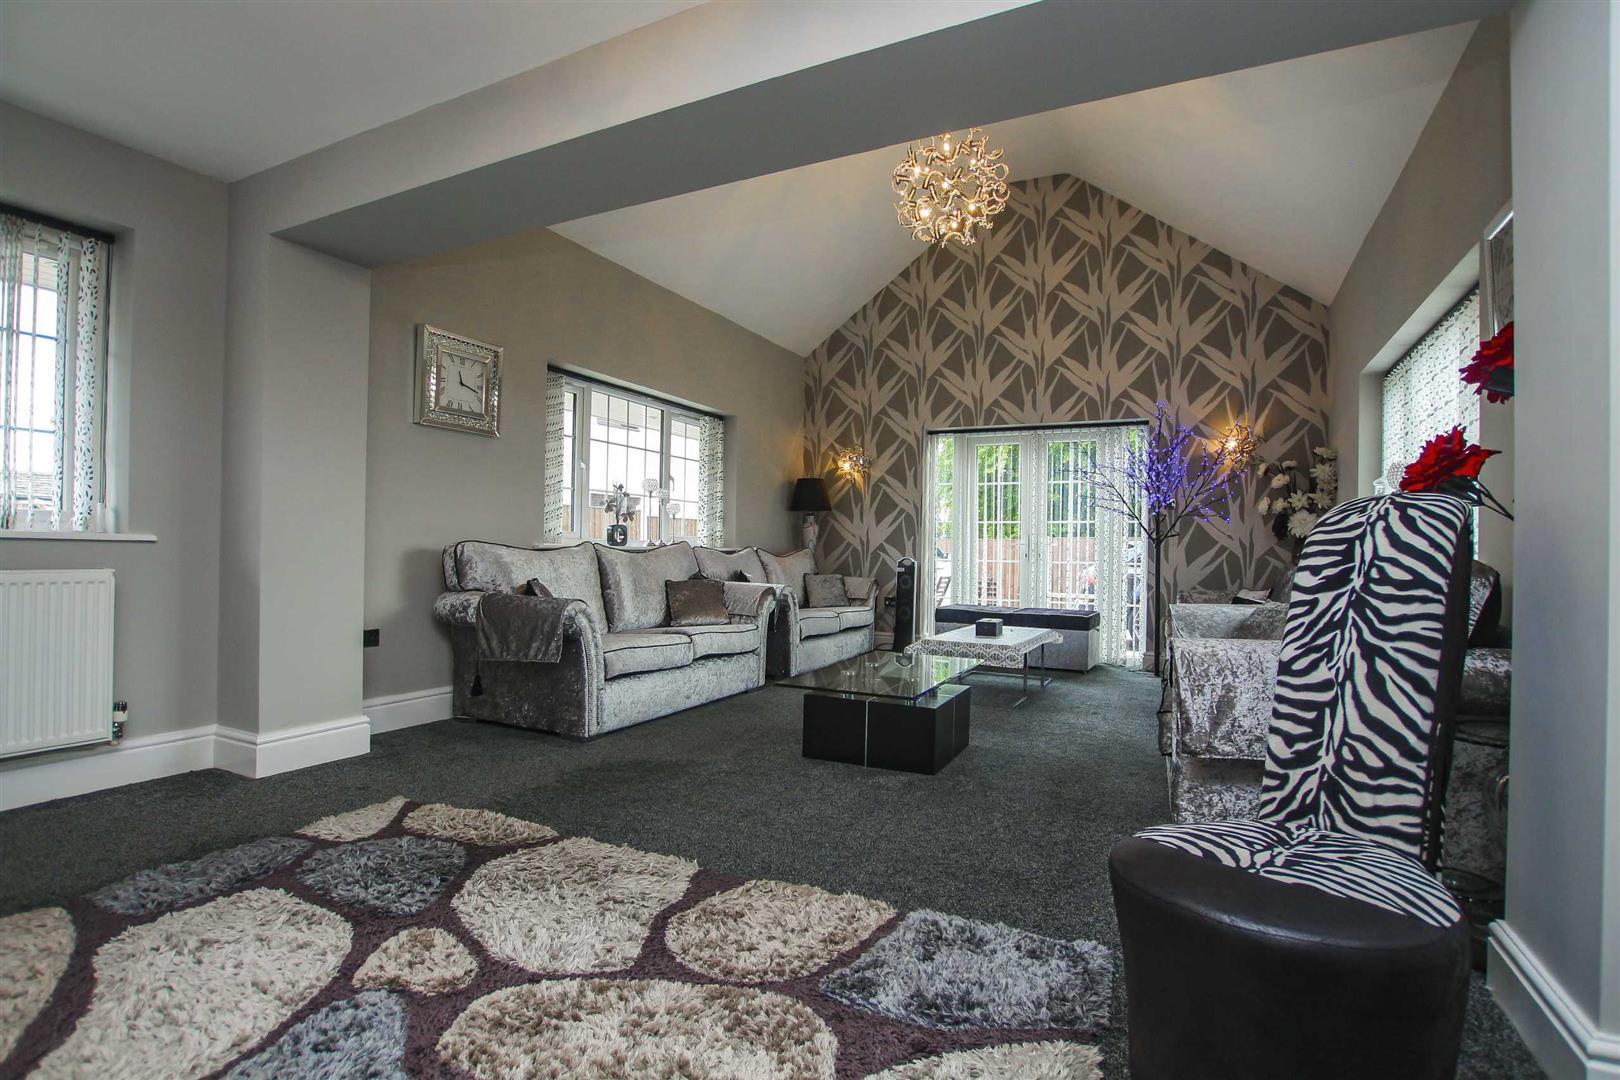 5 Bedroom Detached House For Sale - Image 3